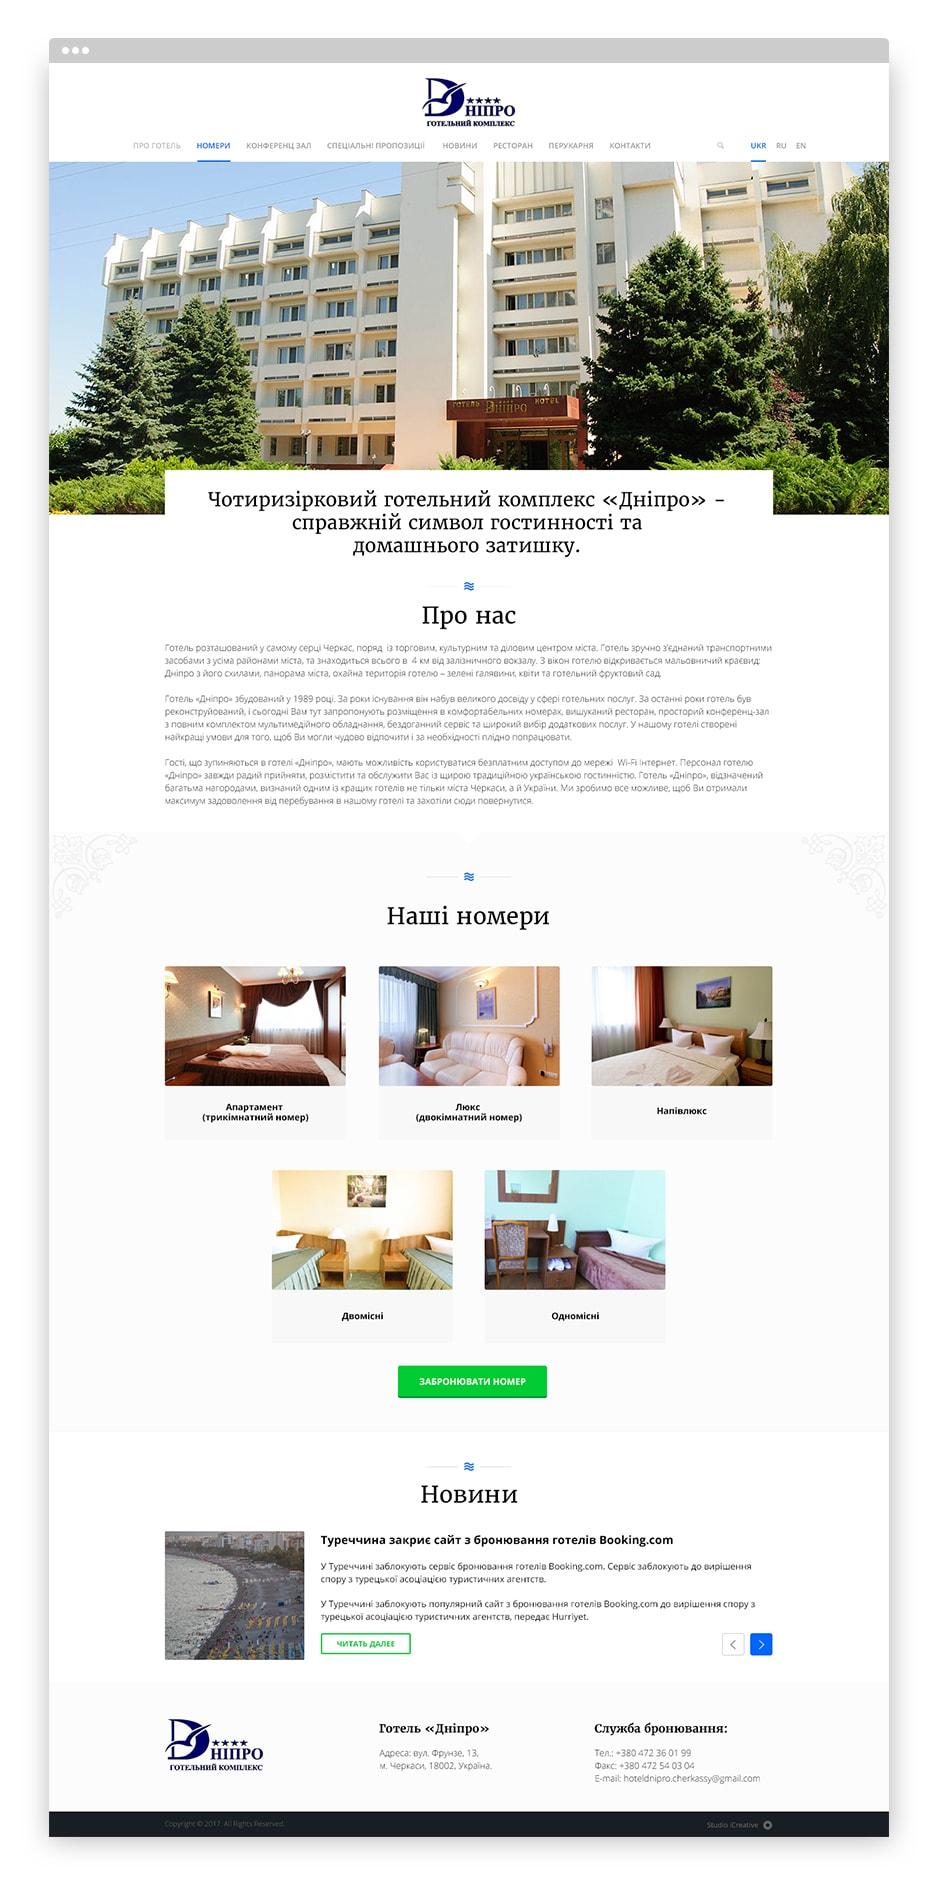 icreative.com.ua_hoteldnipro_1